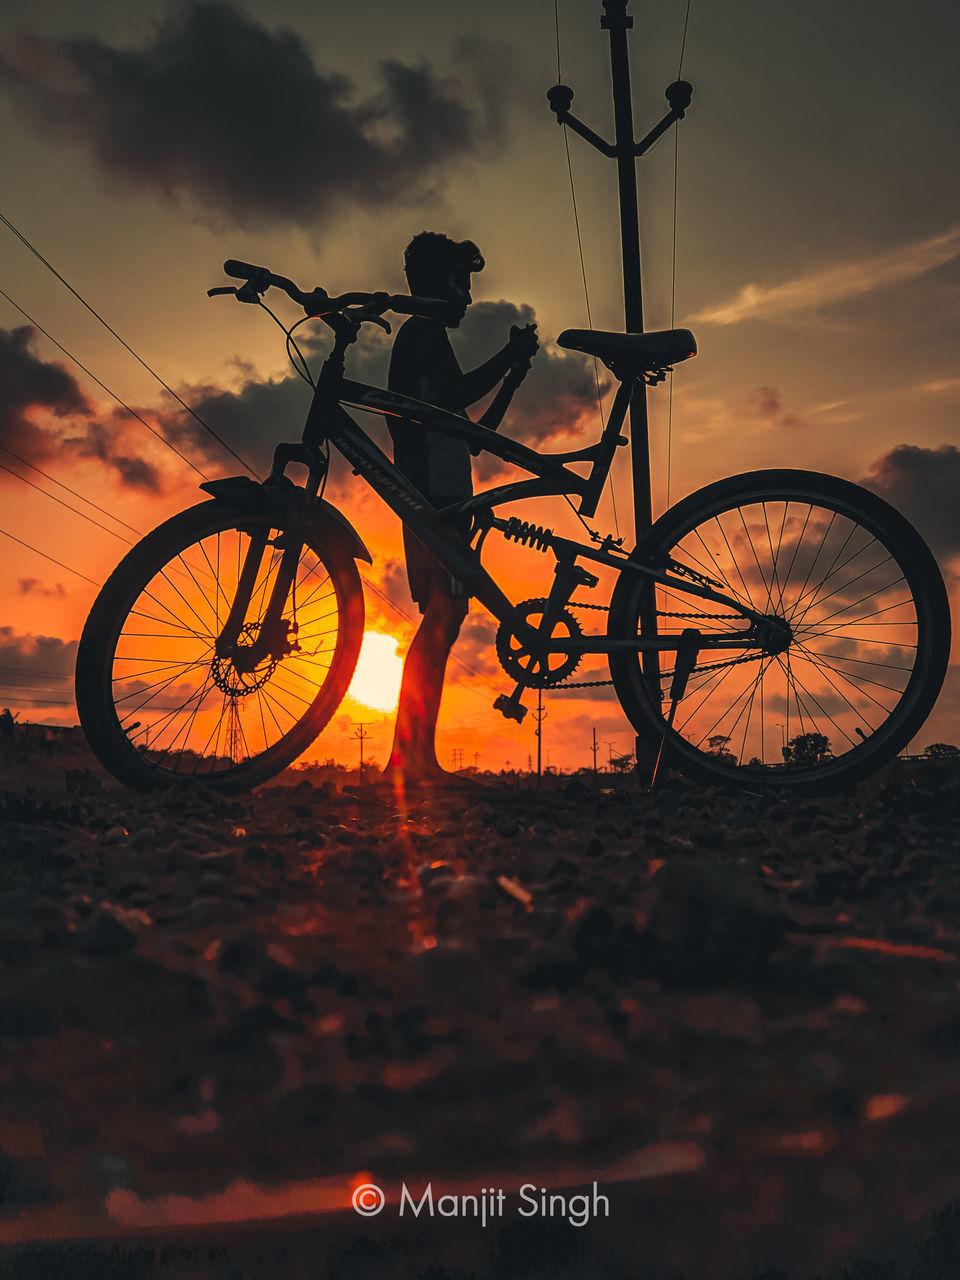 SILHOUETTE BICYCLE AGAINST ORANGE SKY